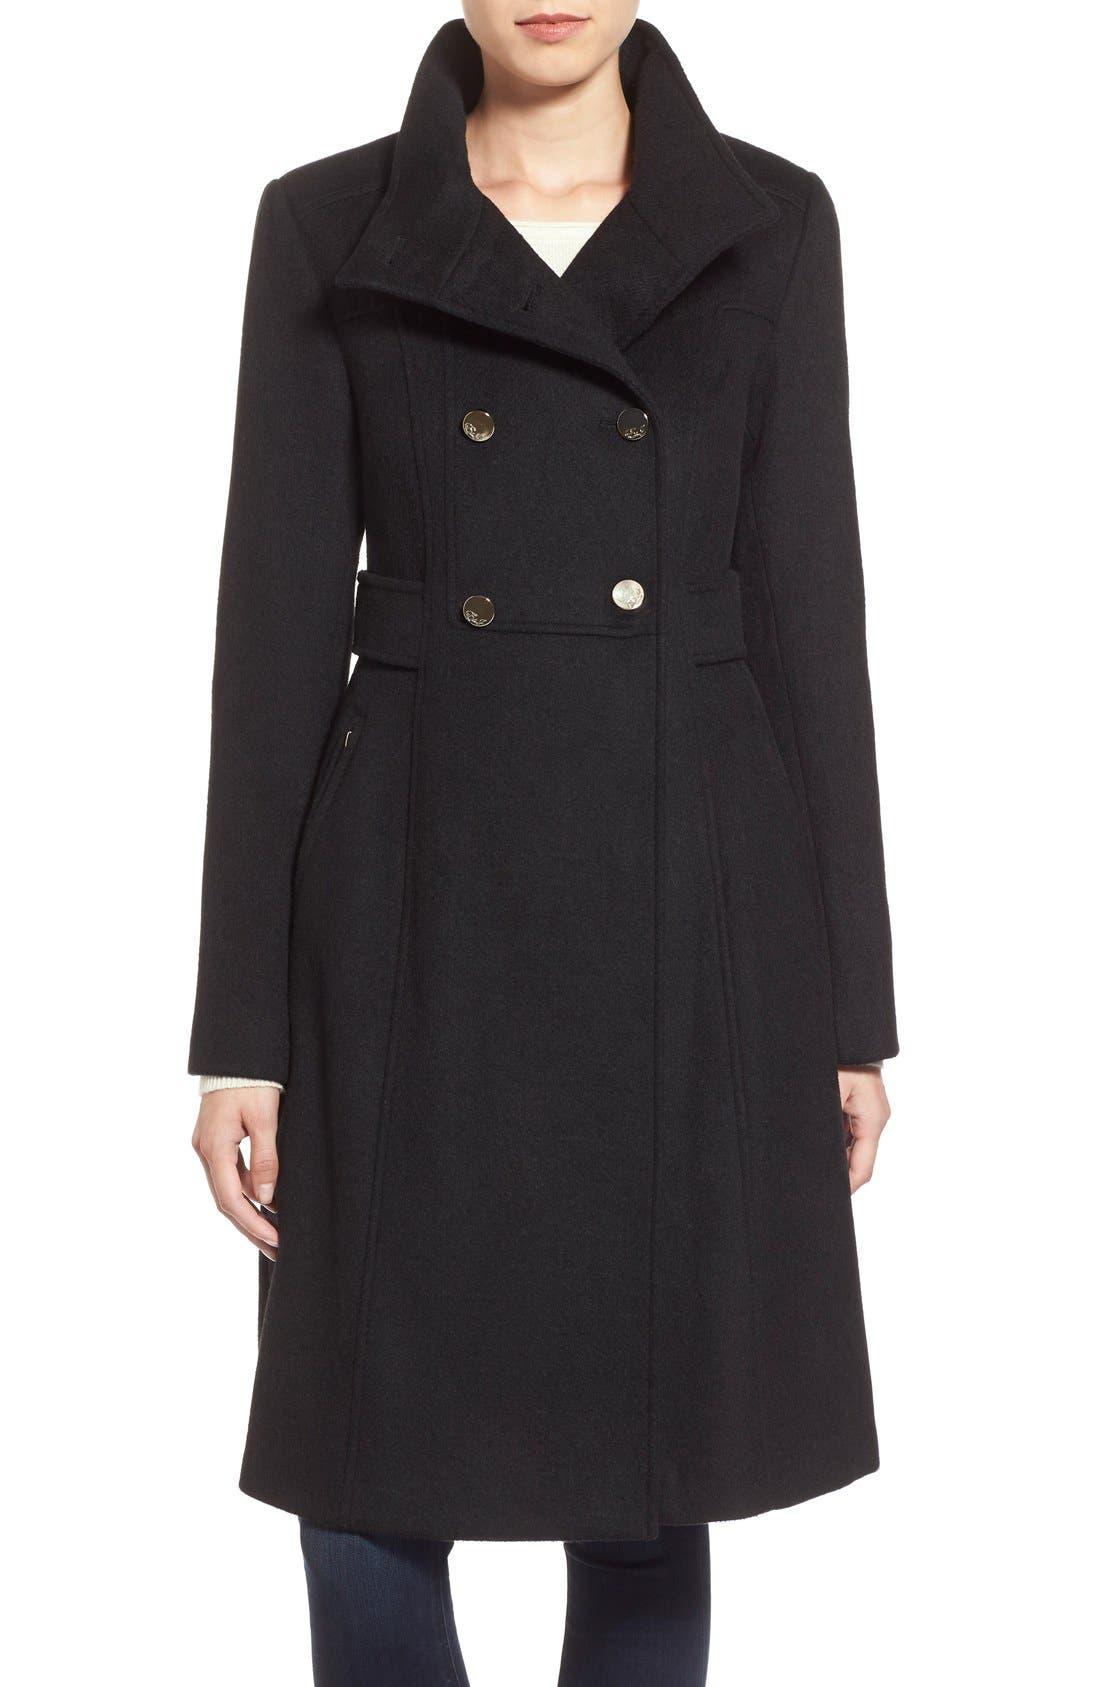 ELIZA J Wool Blend Long Military Coat